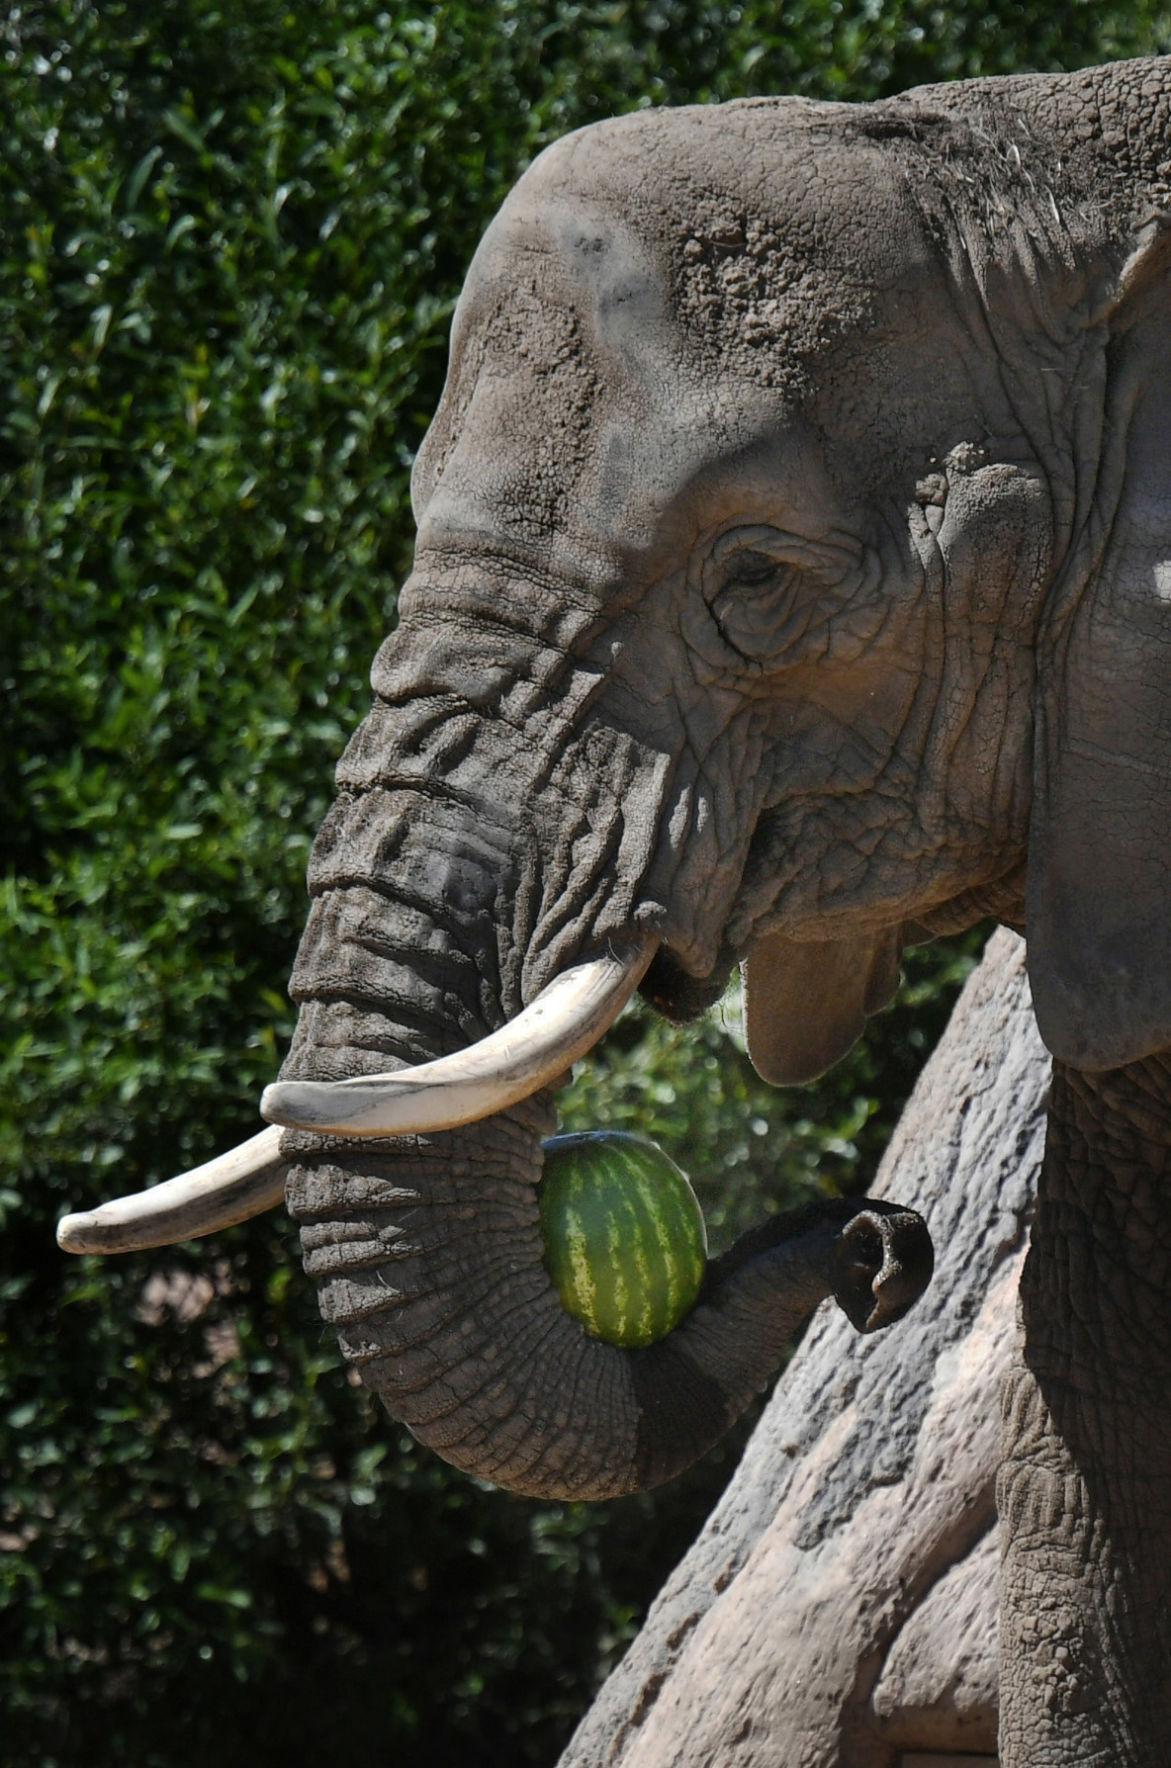 Happy birthday, Missy the elephant!